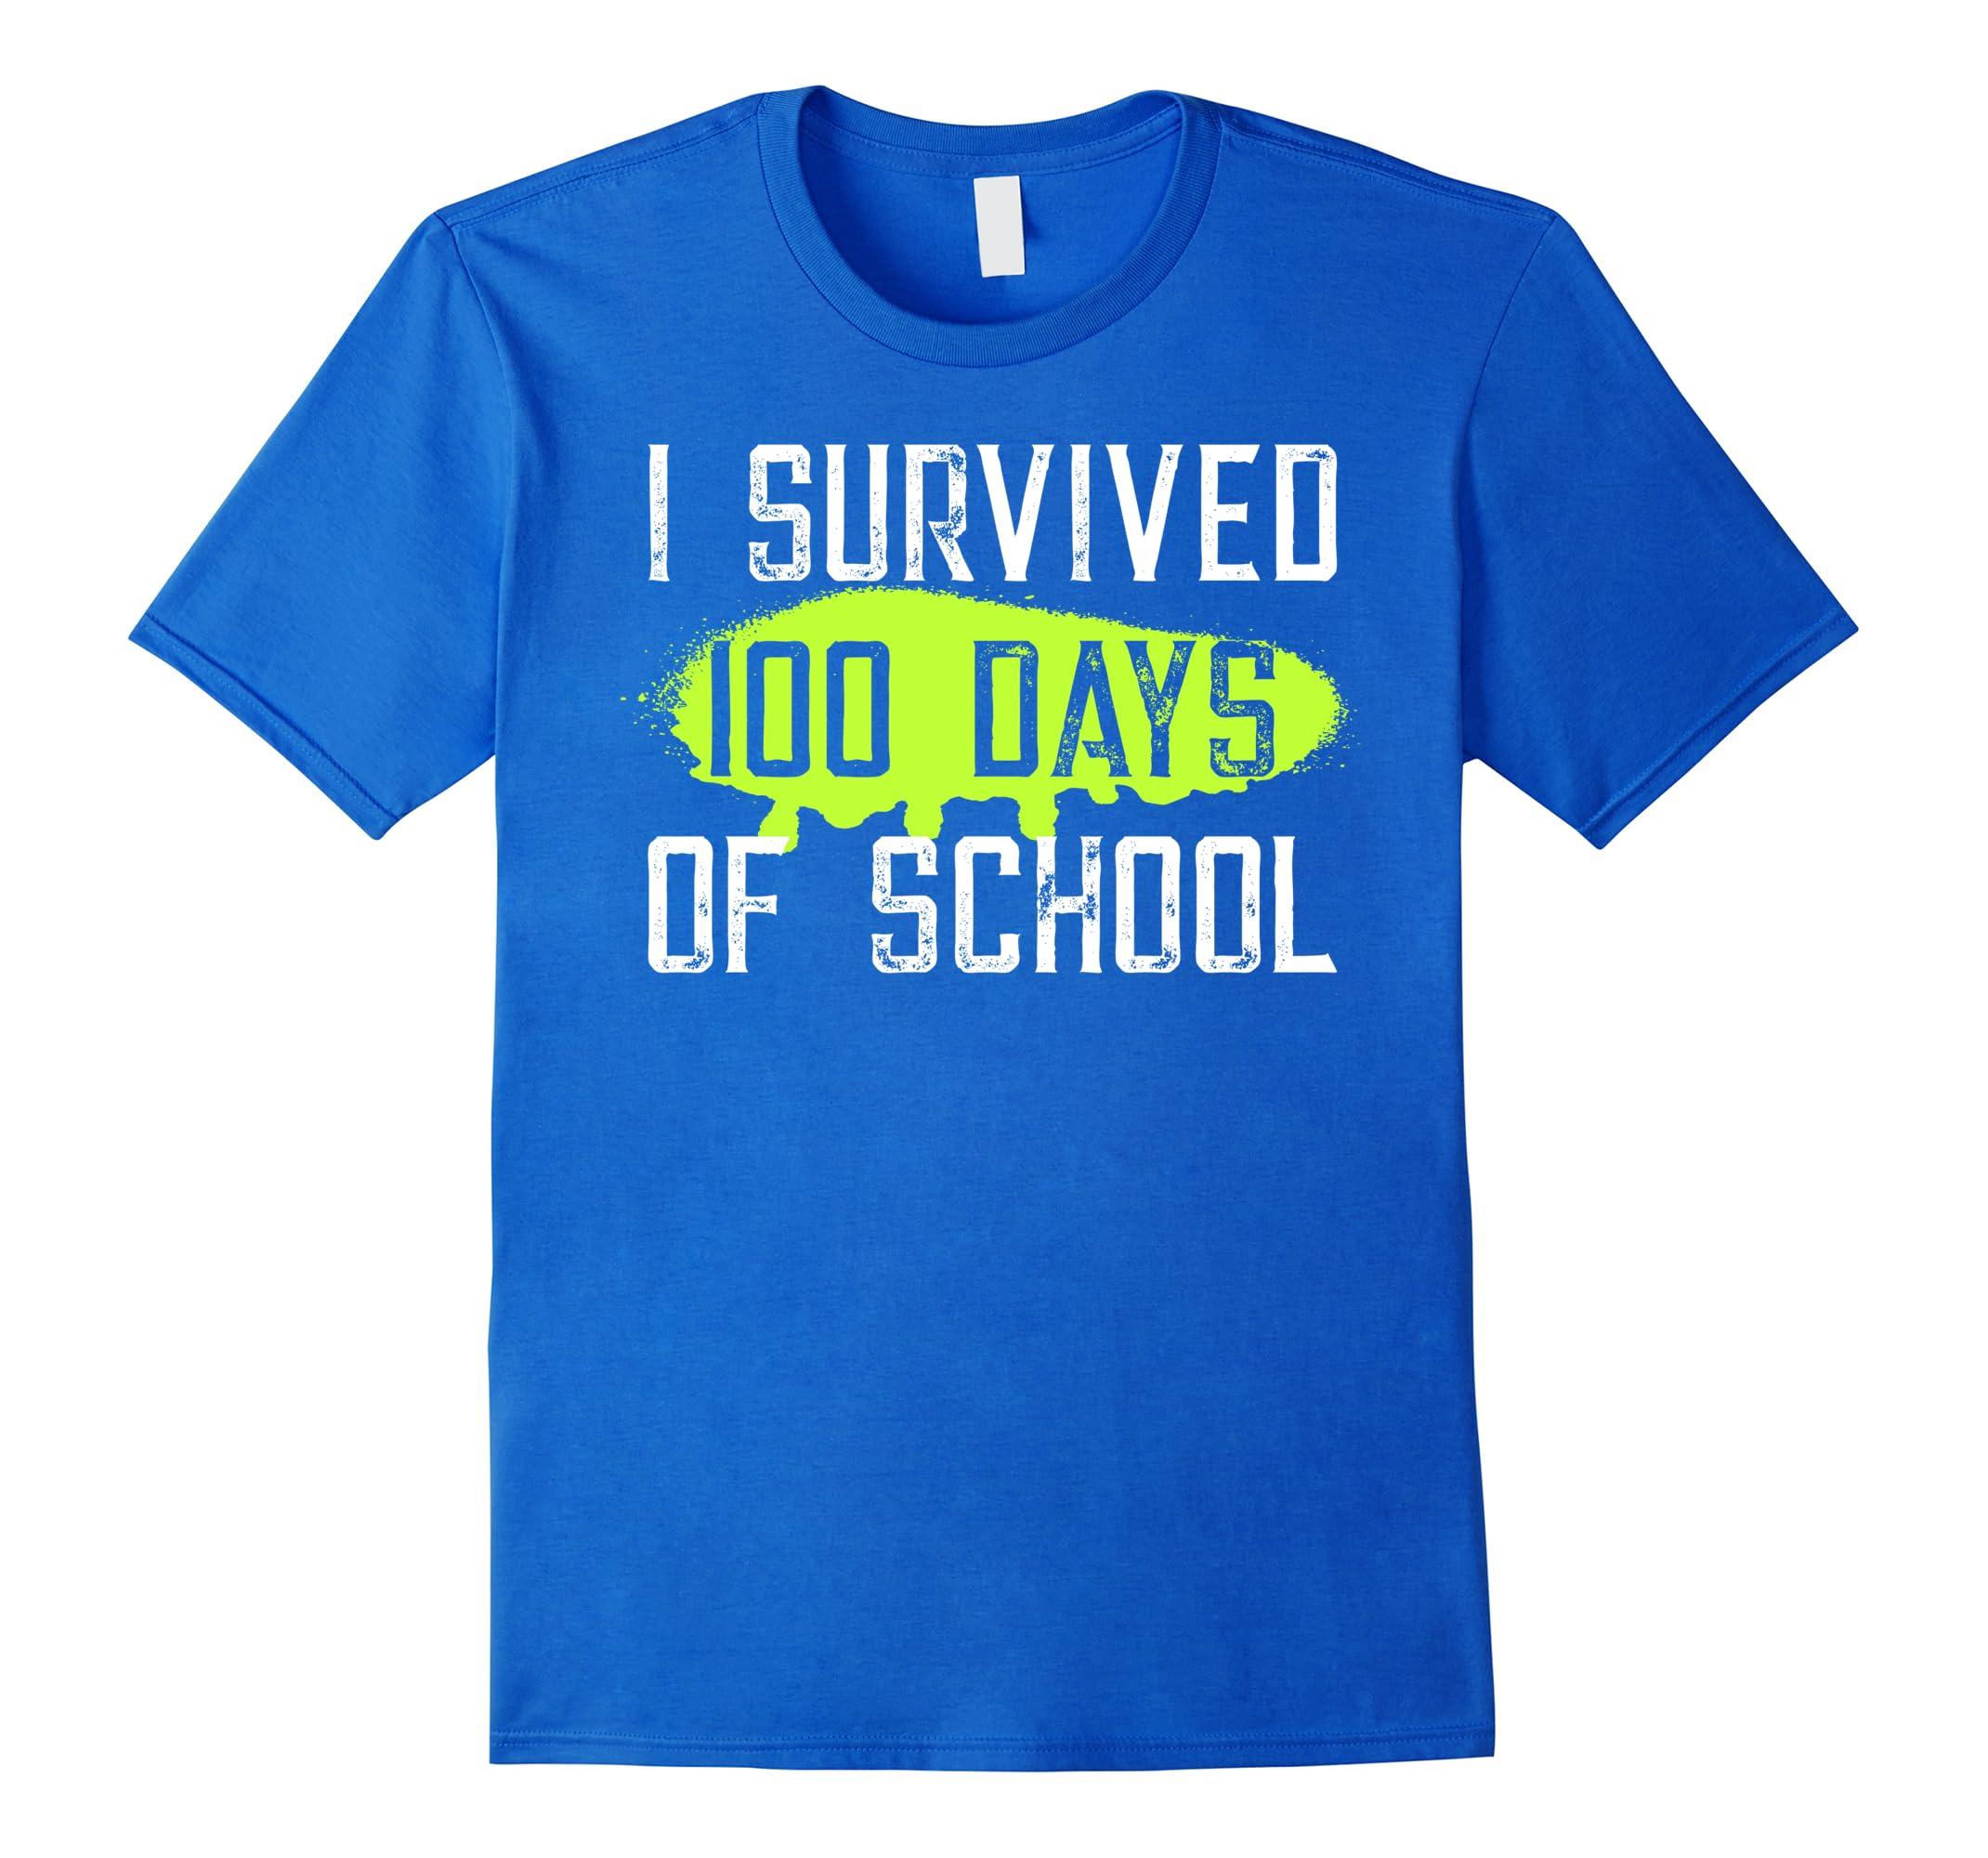 bd6ac495f6 I Survived 100 Days of School T-Shirt-ah my shirt one gift – Ahmyshirt